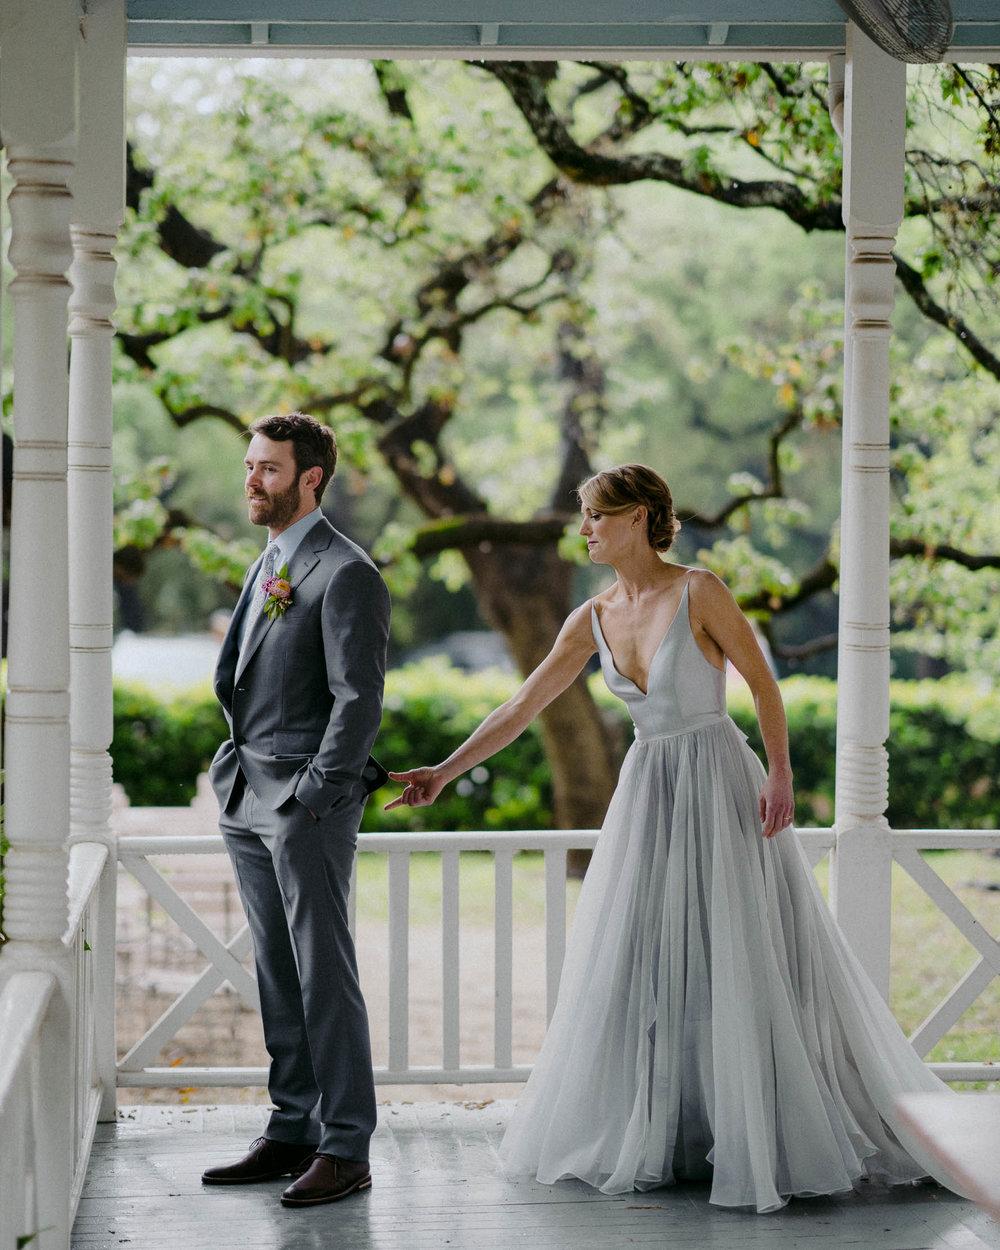 Matties-Green-Pastures-Austin-Wedding-2018.jpg